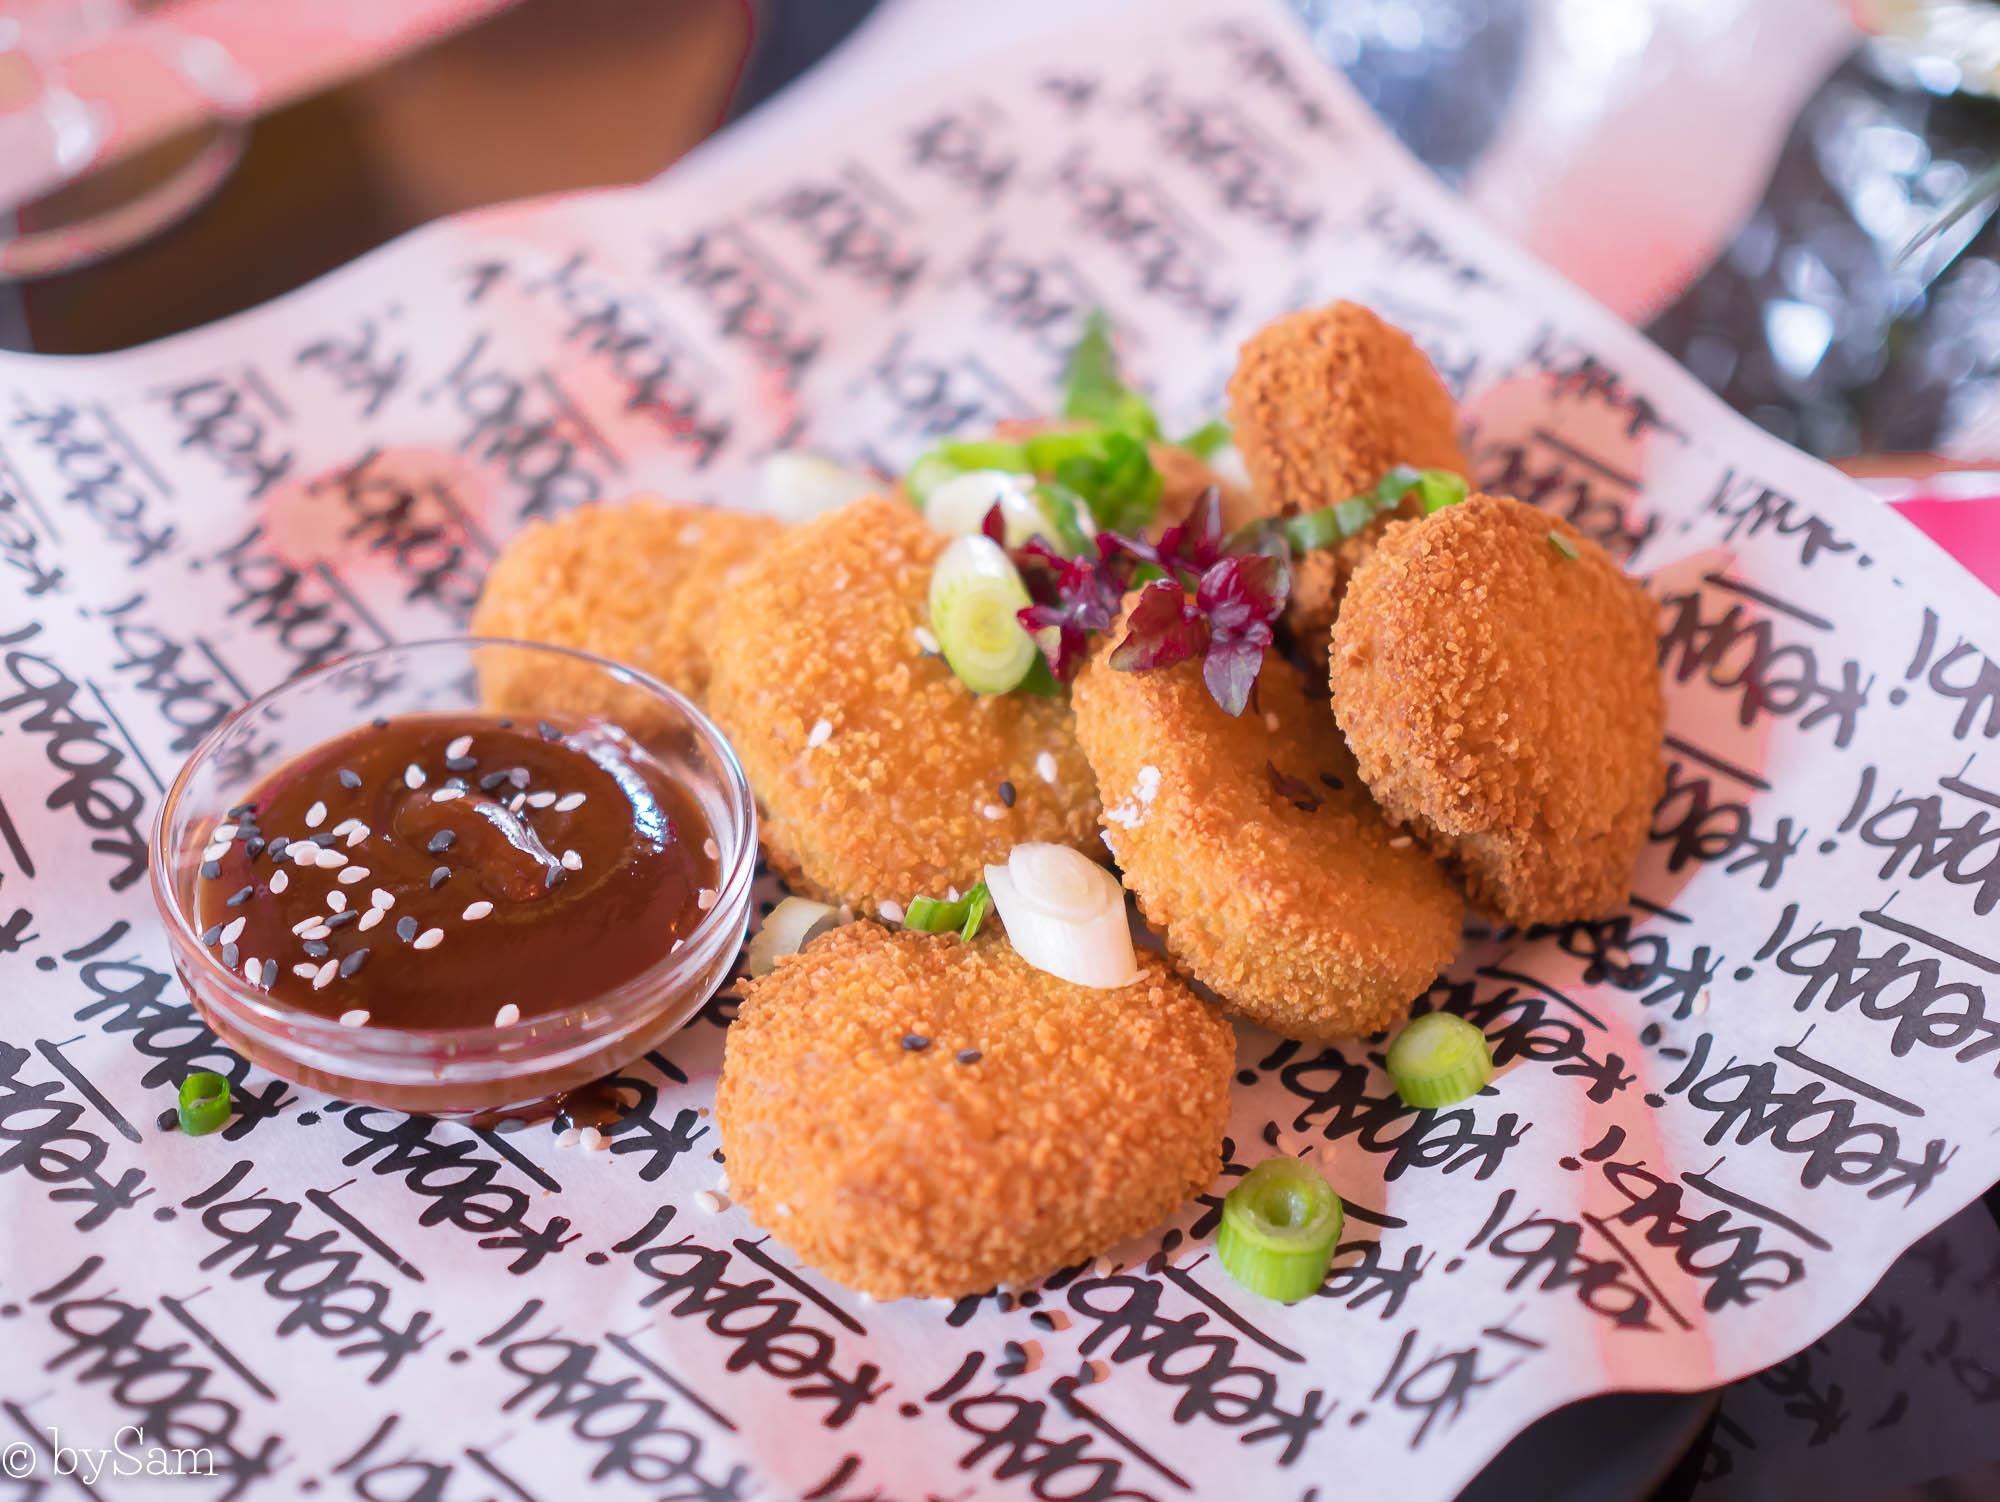 kebabi-vegan-snacks-amsterdam